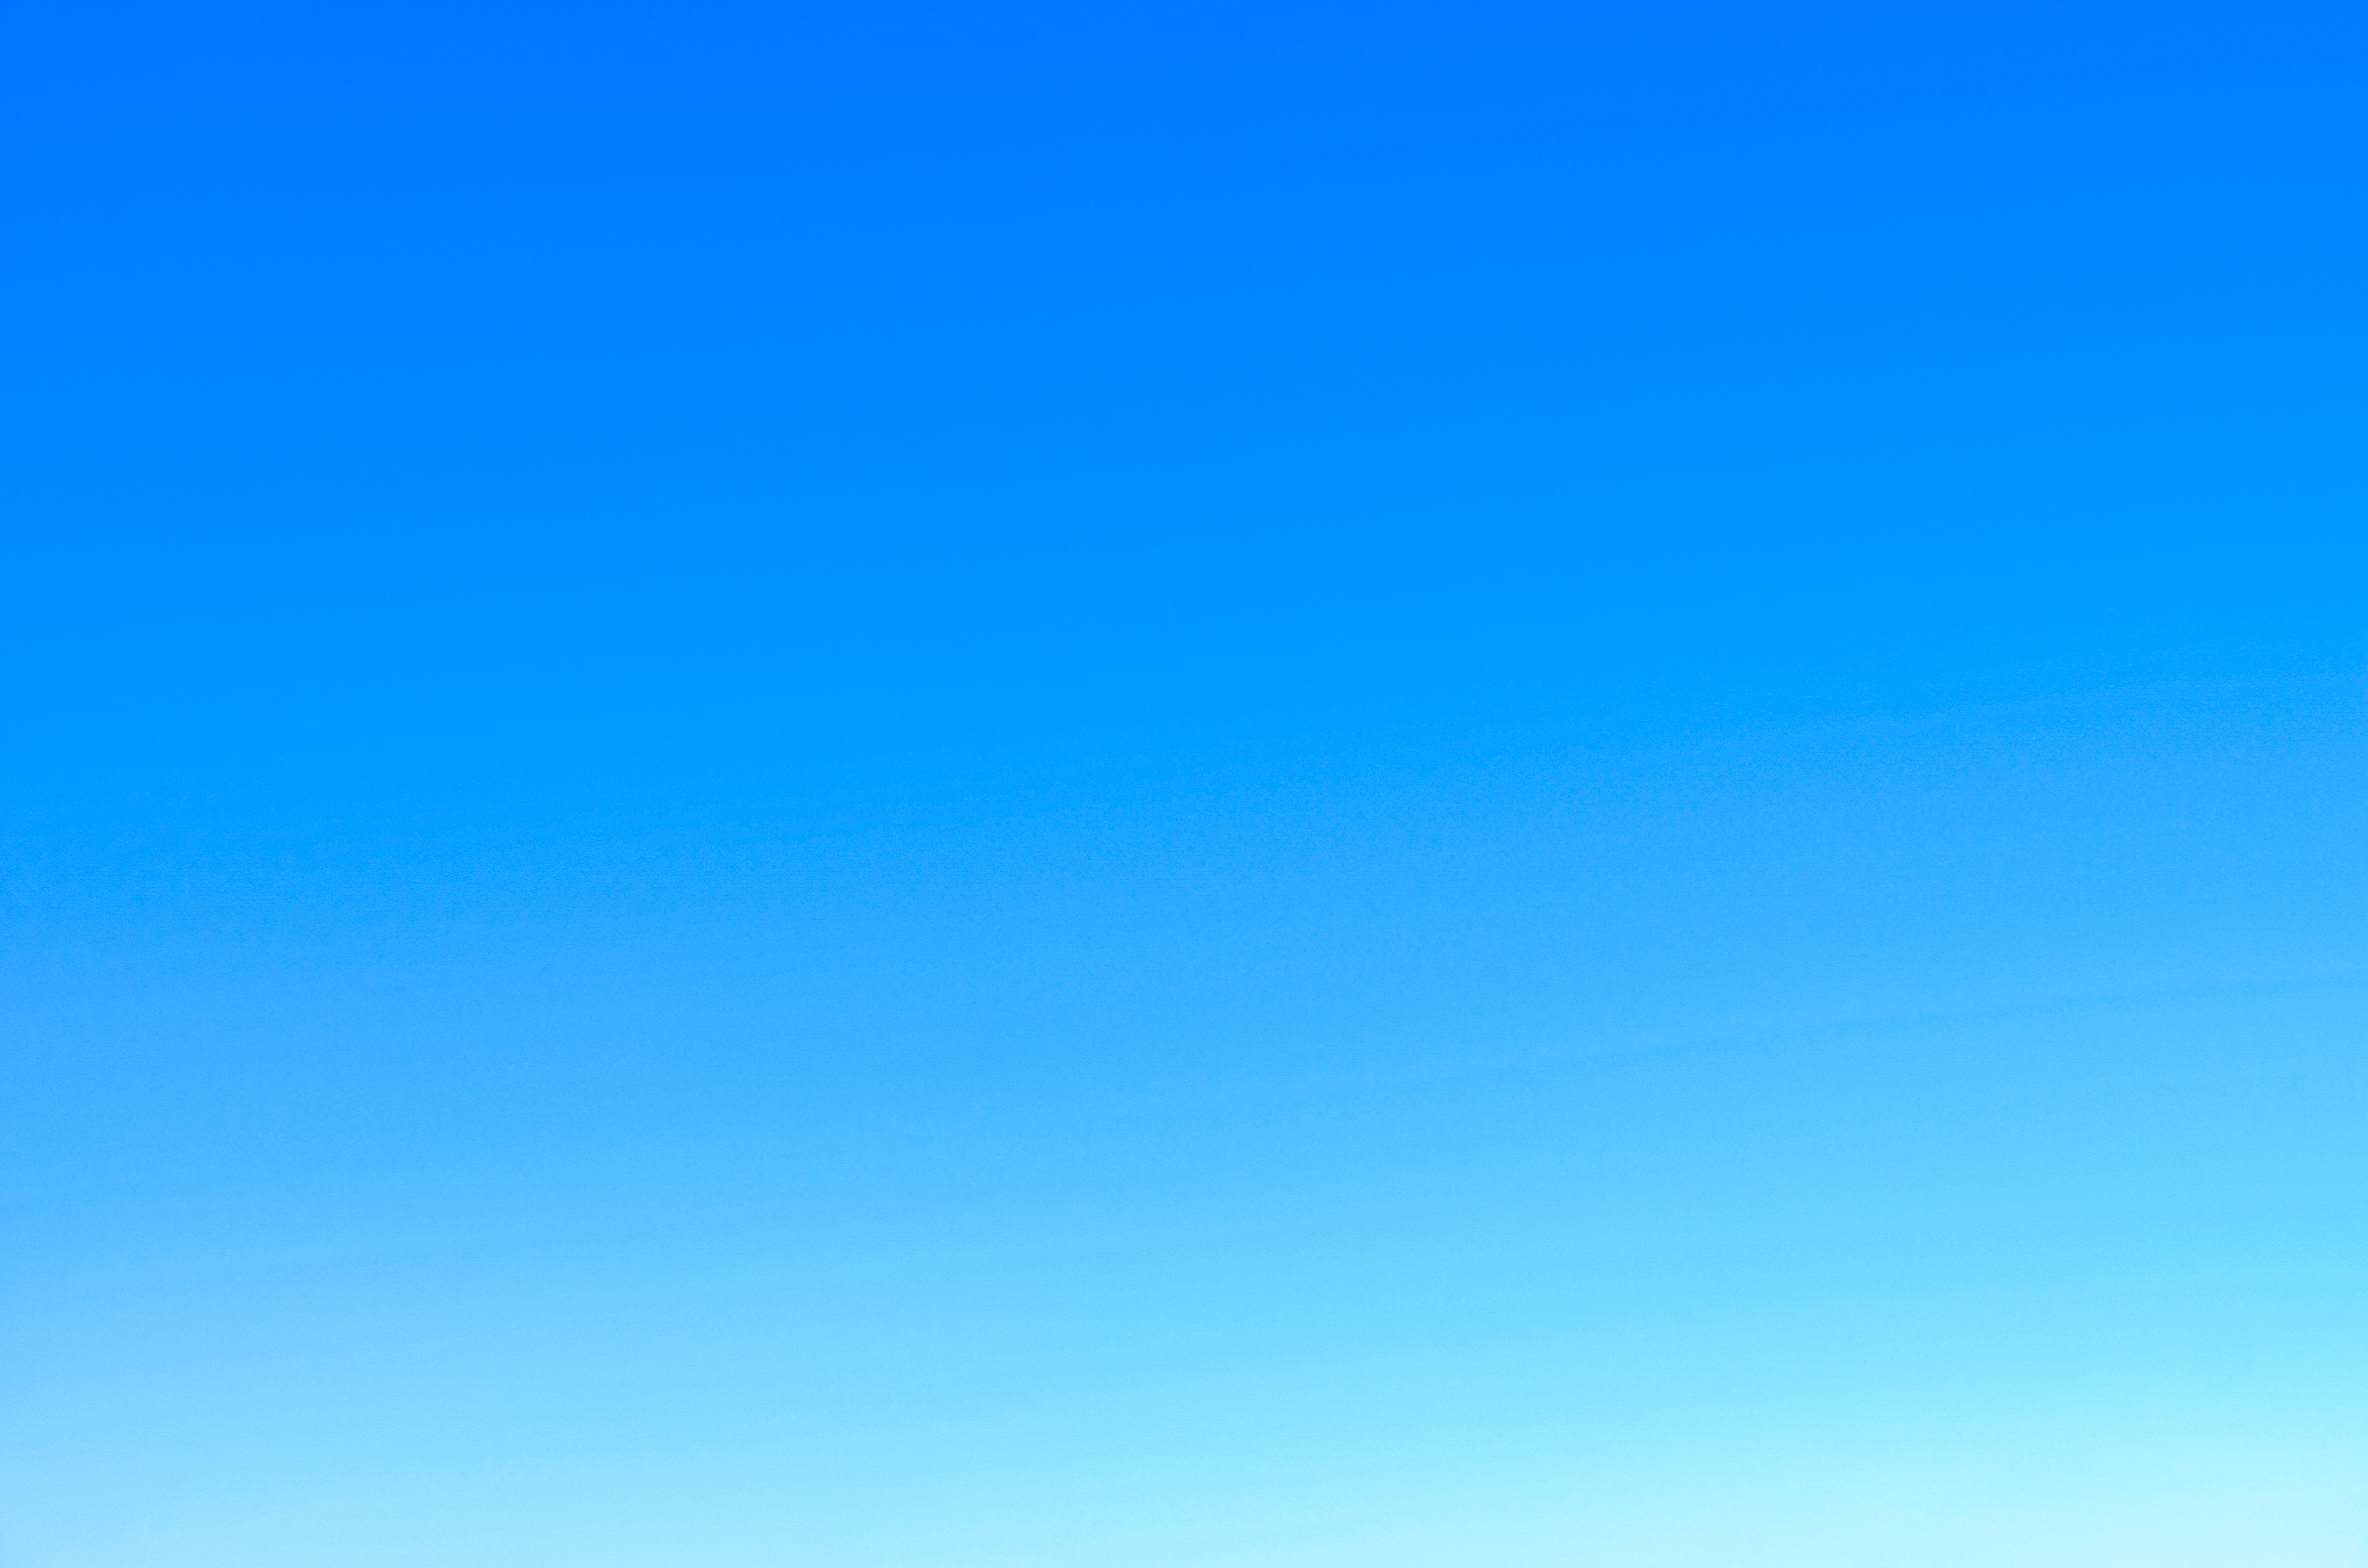 Blue Sky Free Stock Photo